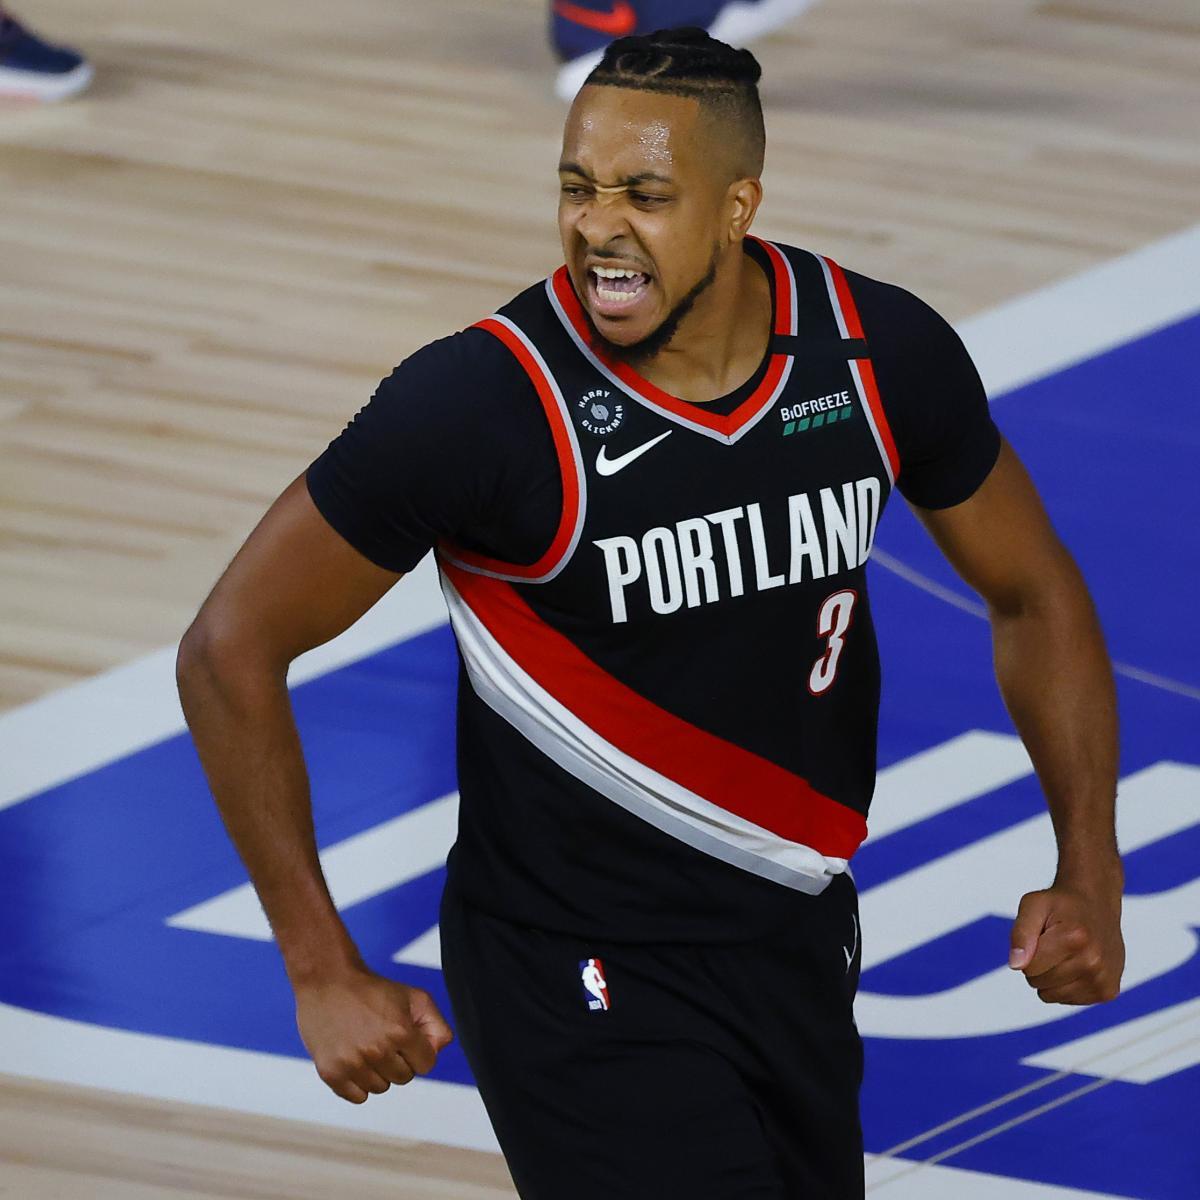 NBA Playoffs 2020: Breaking Down the Updated Championship Bracket